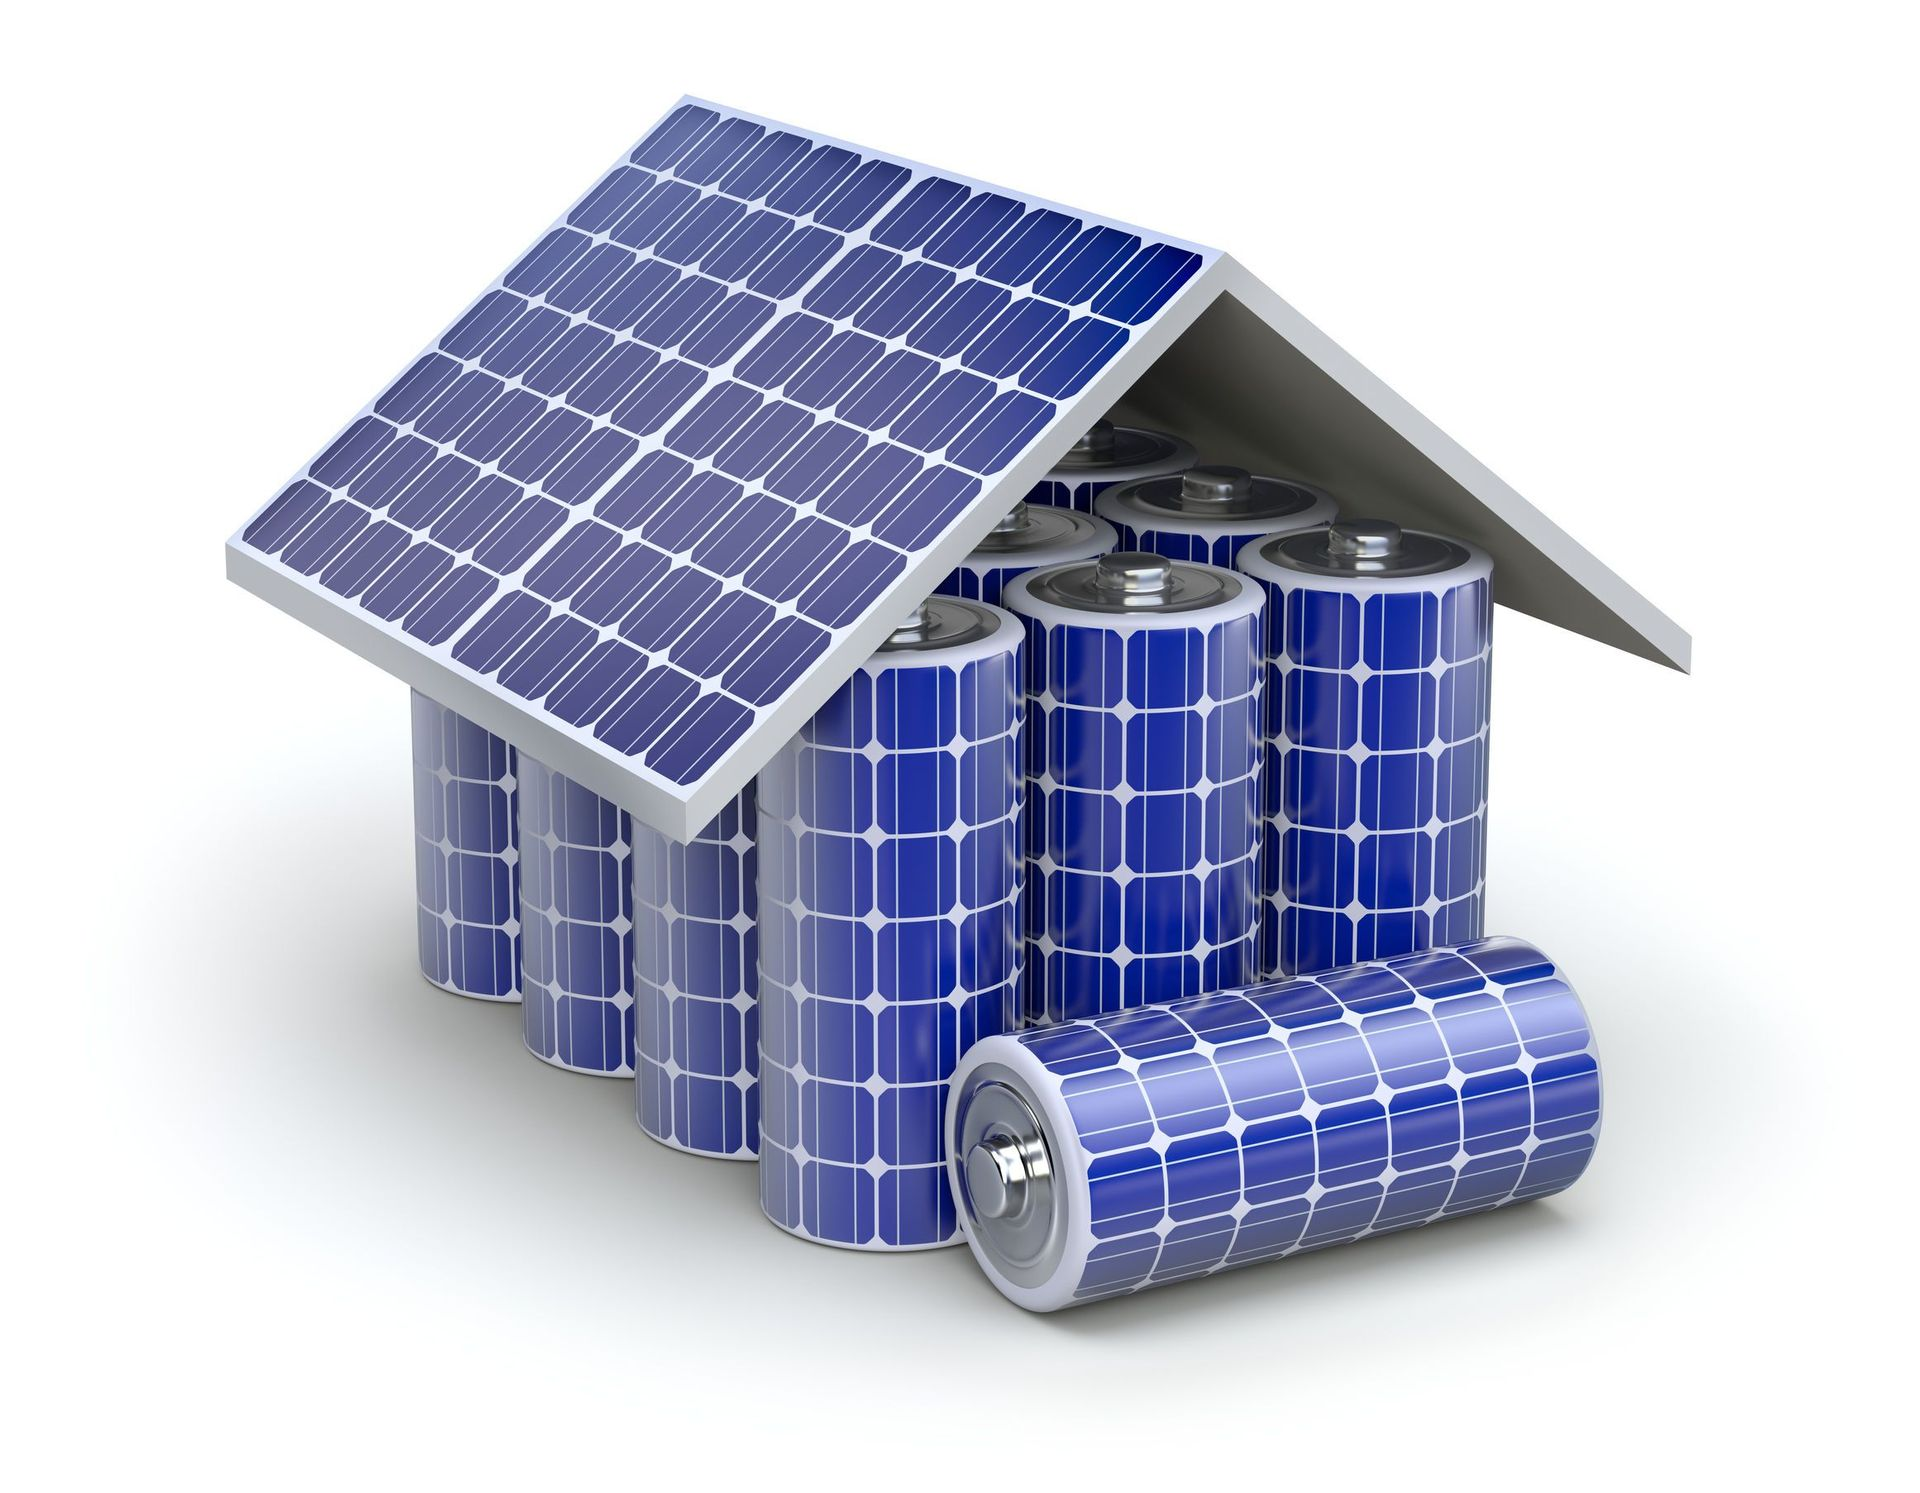 photovoltaik I speicher - photovoltaik I